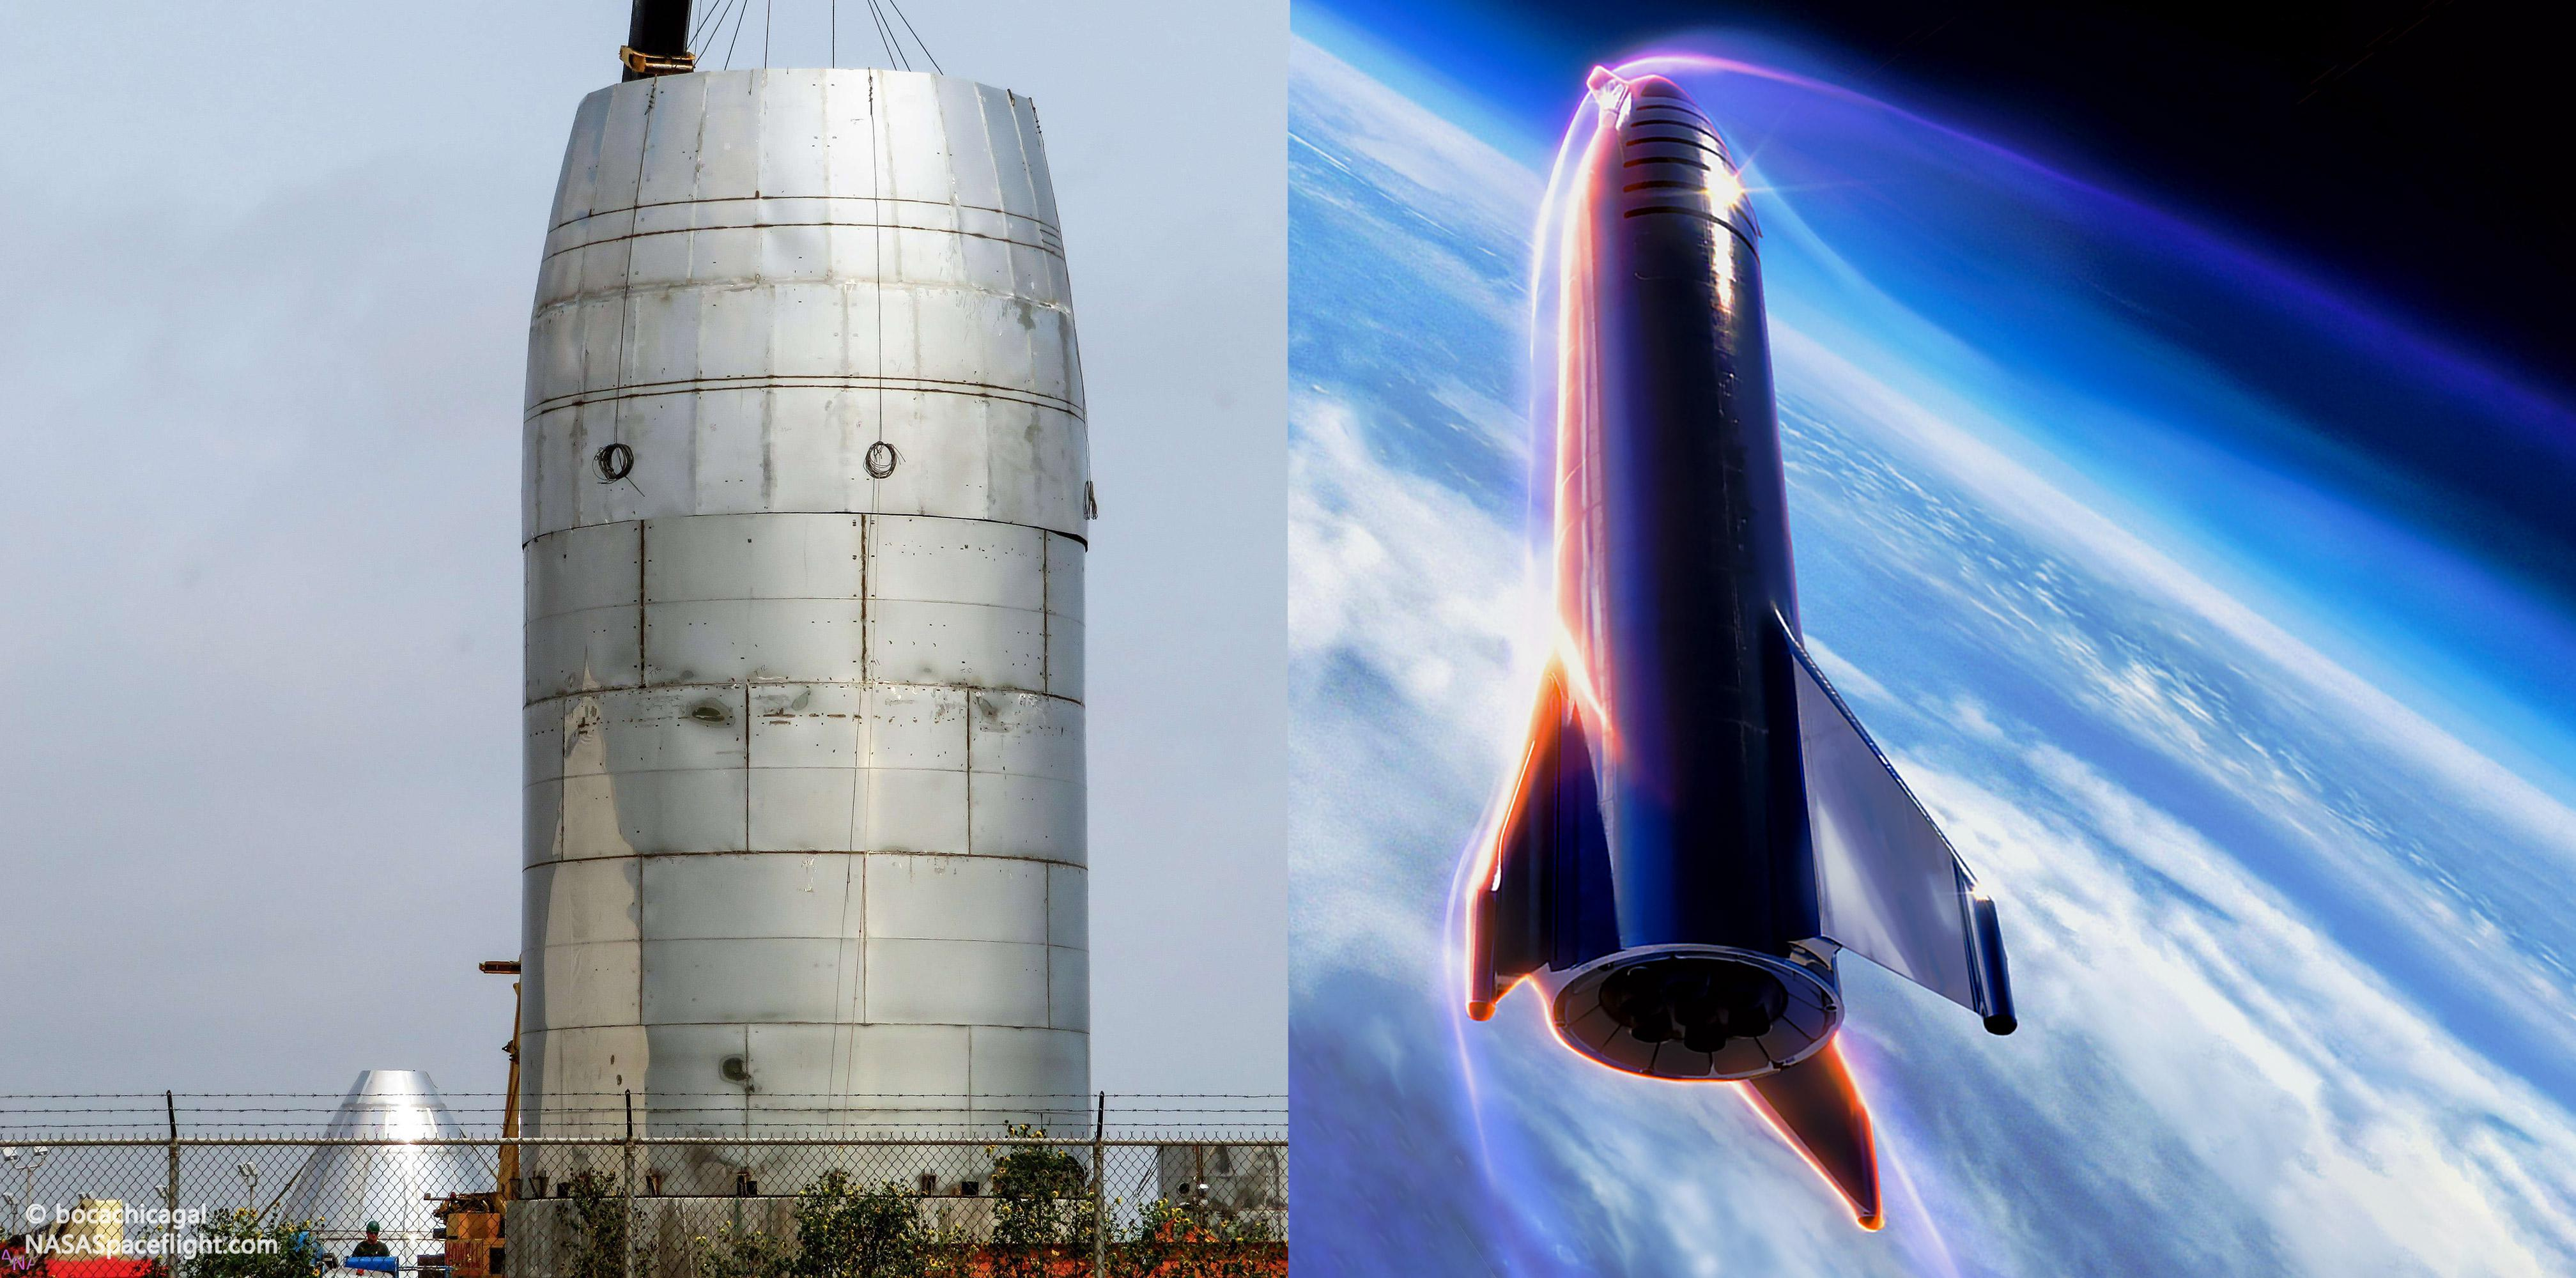 Boca Chica orbital Starship progress 050919 (NASASpaceflight – bocachicagal) render feature 1(c)